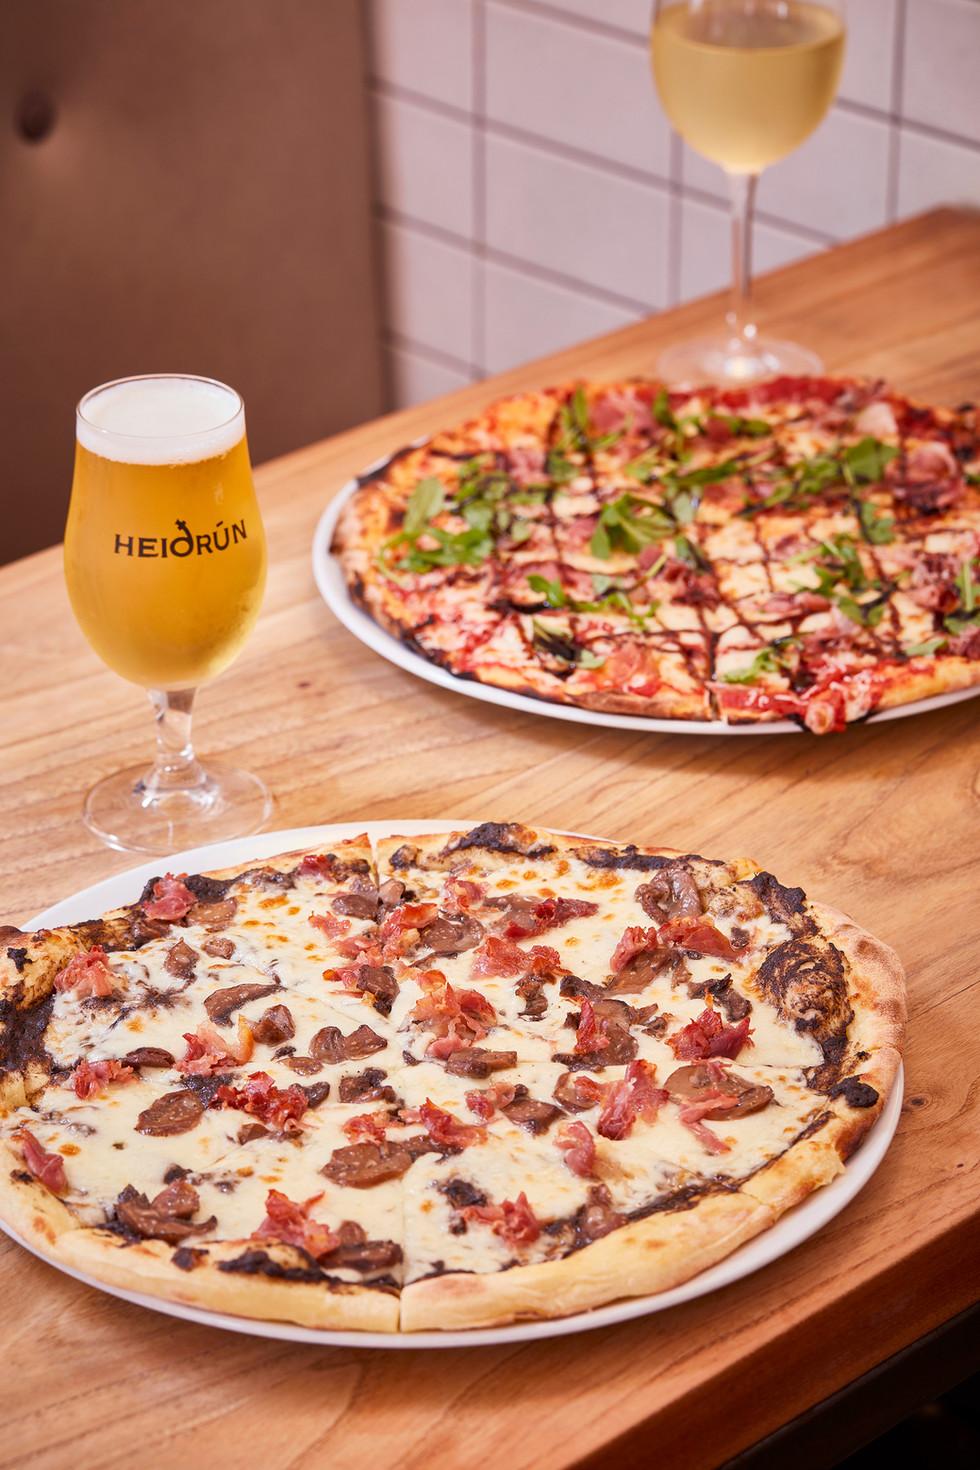 Heidrun-Gallery-Pizza.jpg